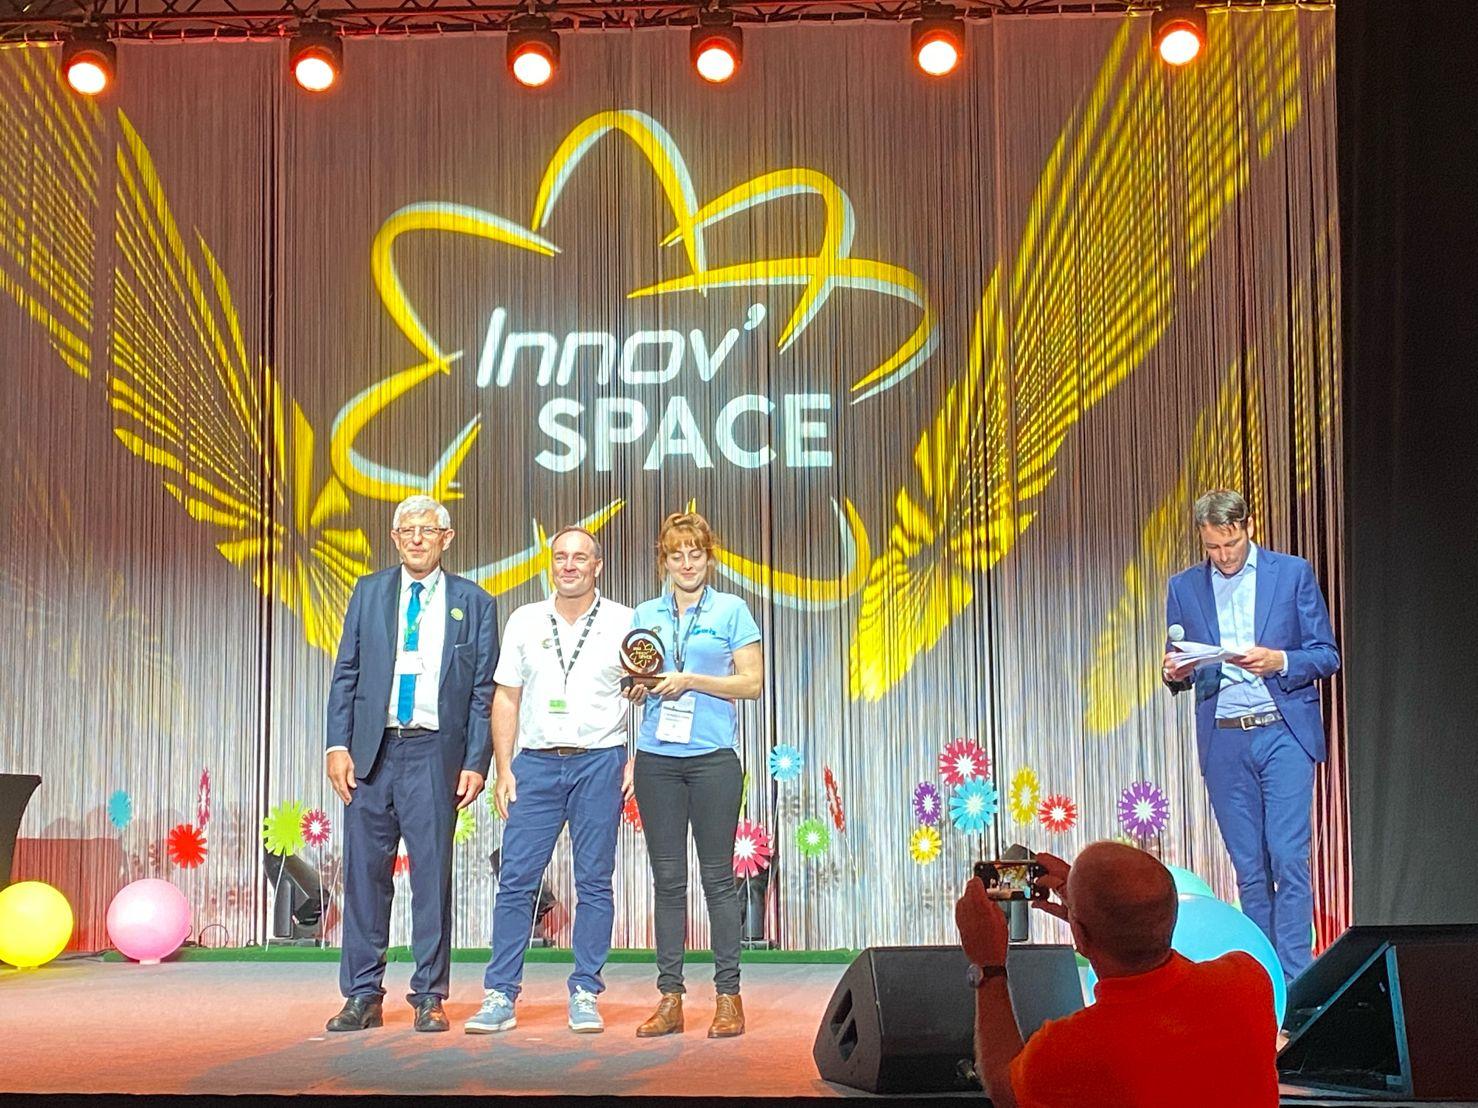 Alban Pobla and Emma Cantaloube awarded for Gwiz at Innovspace 2021